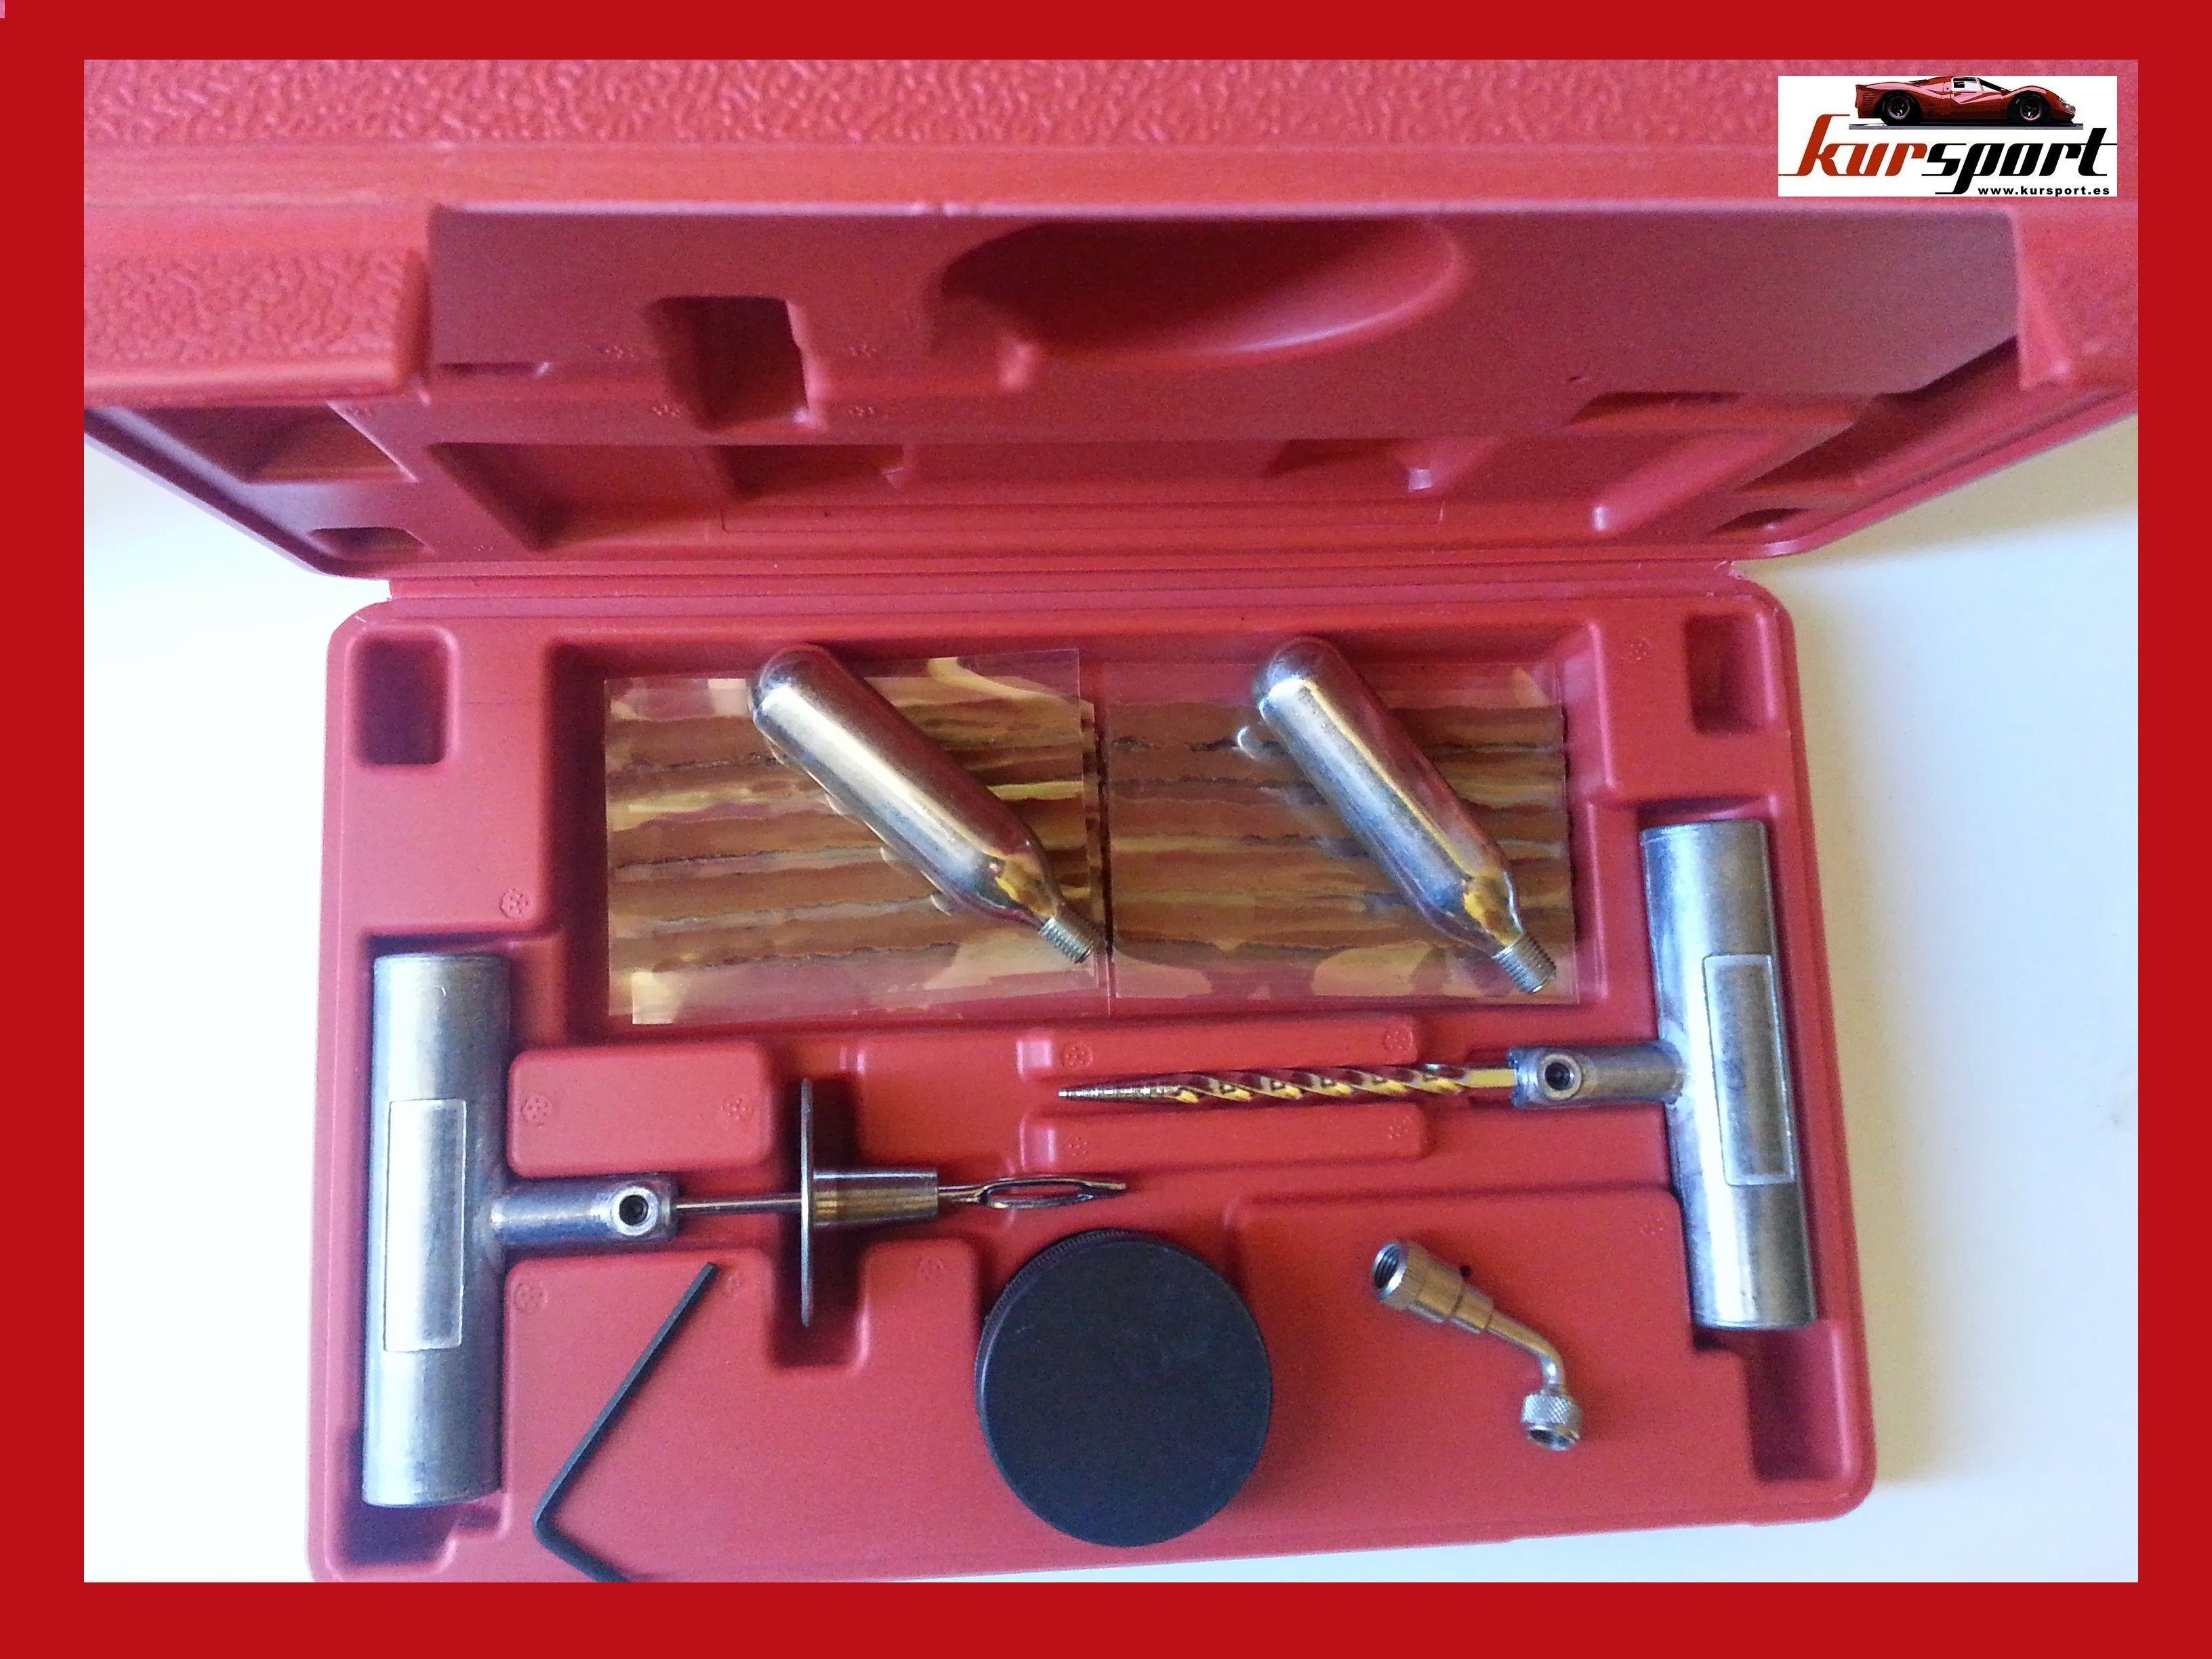 Pin De Accesorios Para Coches Y Motos En Kit Reparacion Pinchazos De Emergencia Neumaticos Tubeless Neumaticos Reparación Motos